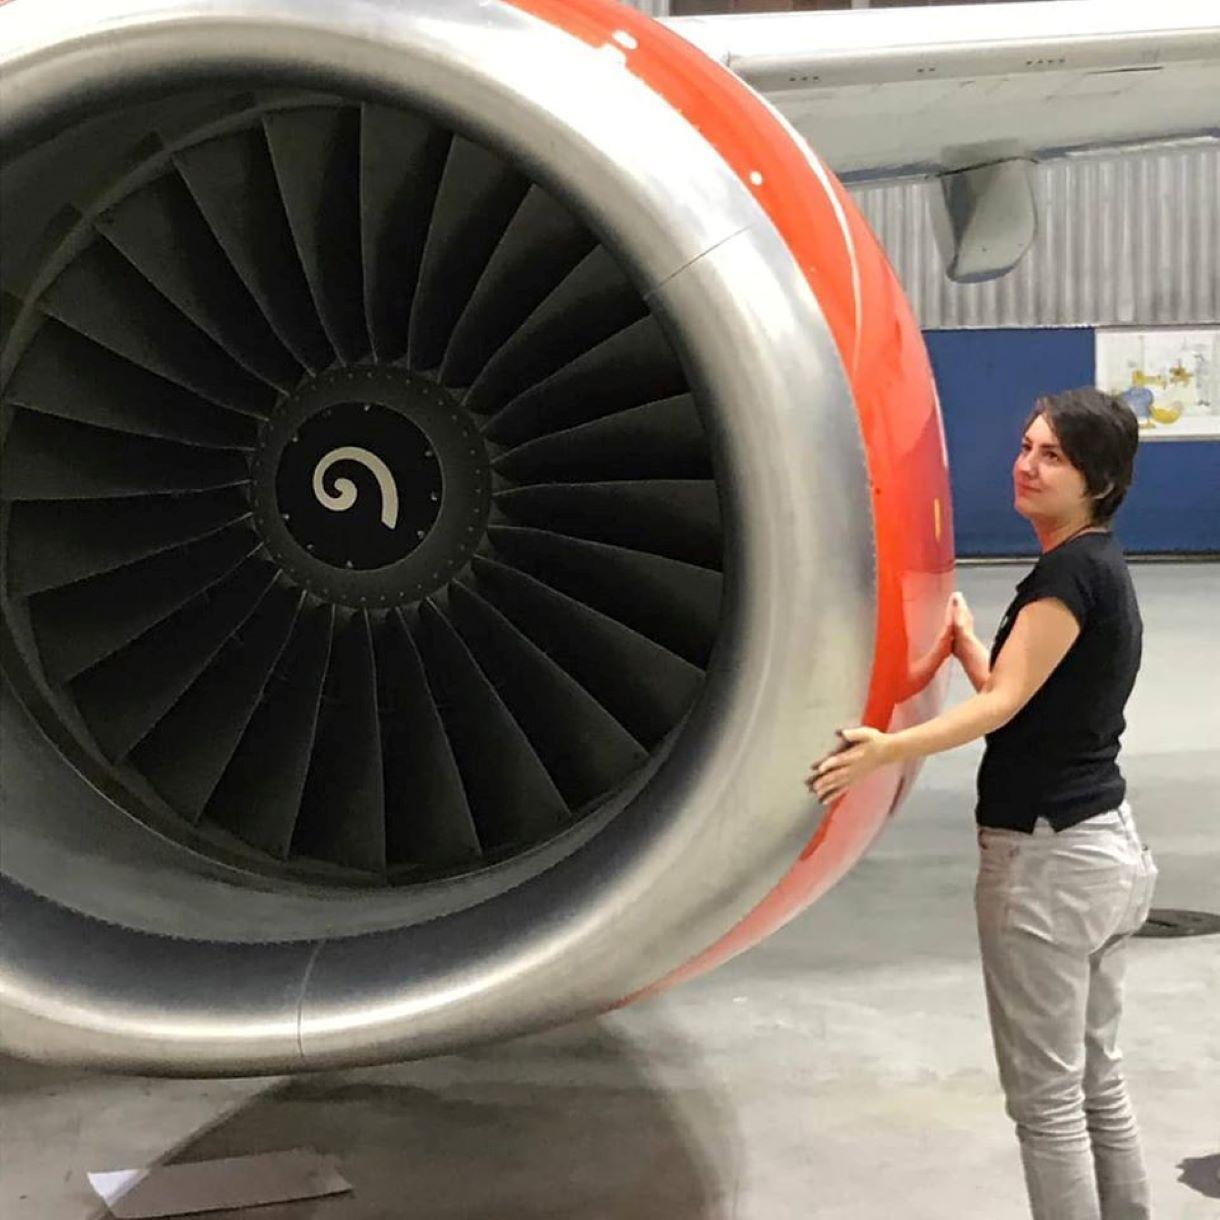 donna sposa aereo